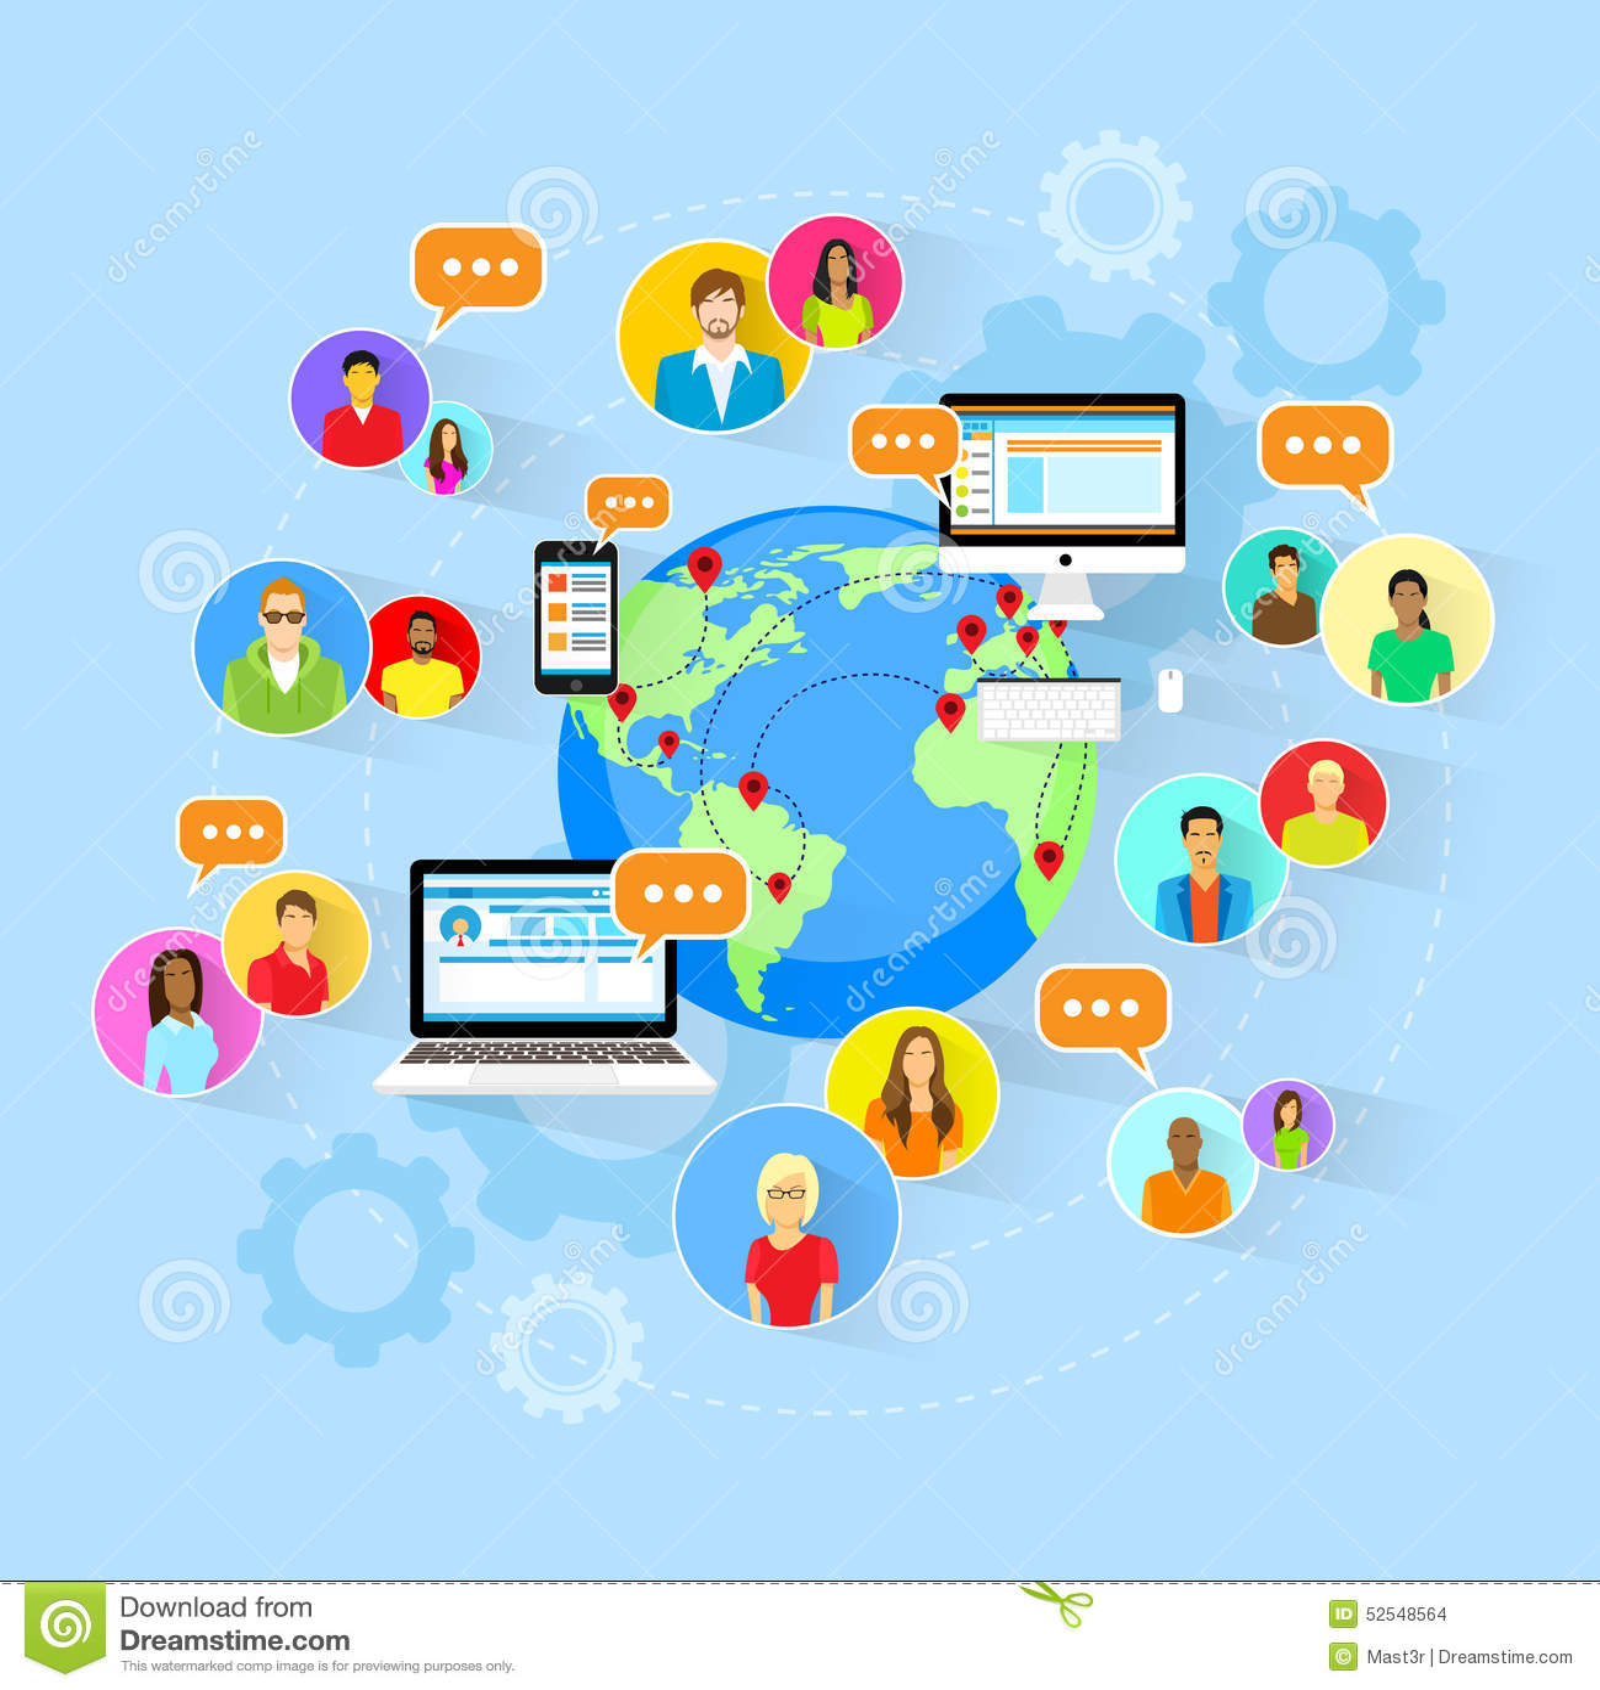 global media บริษัท เจ เอส แอล โกลบอล มีเดีย จํากัด (ชื่อเดิม บริษัท เจ เอส แอล จำกัด ) ก่อตั้งเมื่อ 8 พฤศจิกายน 2522 โดยเริ่มต้นจากการผลิตรายการ.